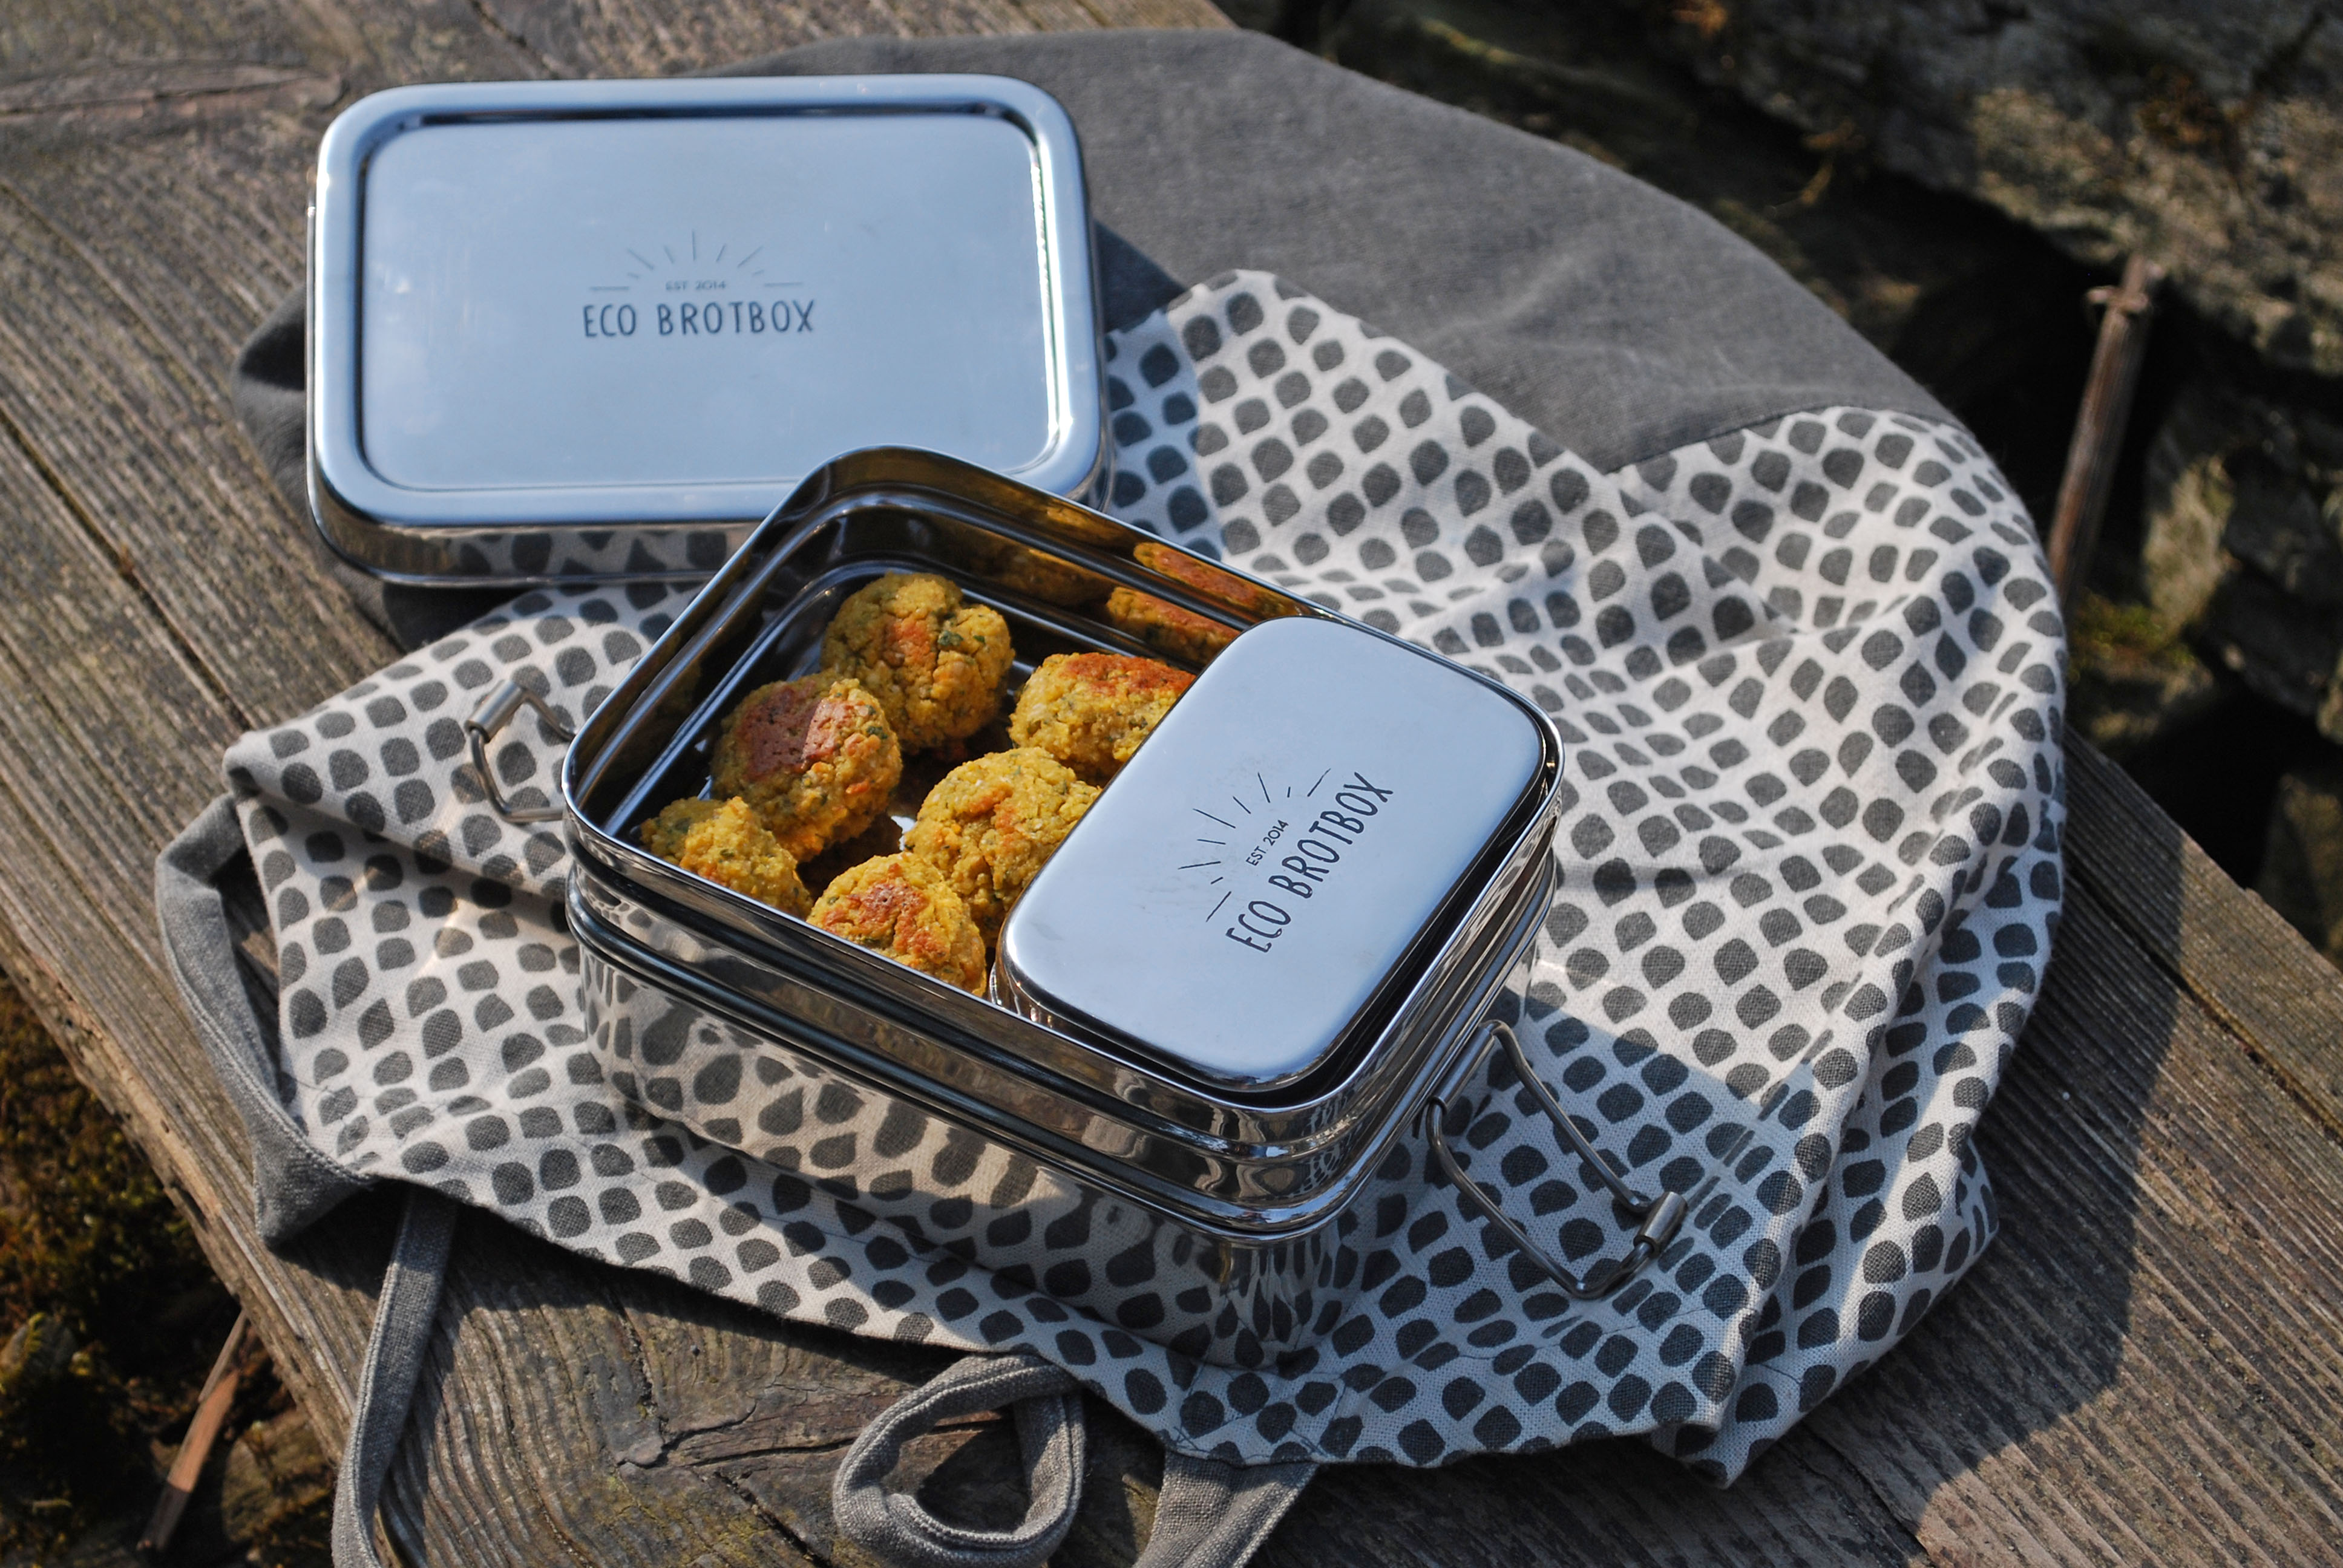 Vegane Picknick Ideen Falafel & Taboulé   Tiny Green Footsteps